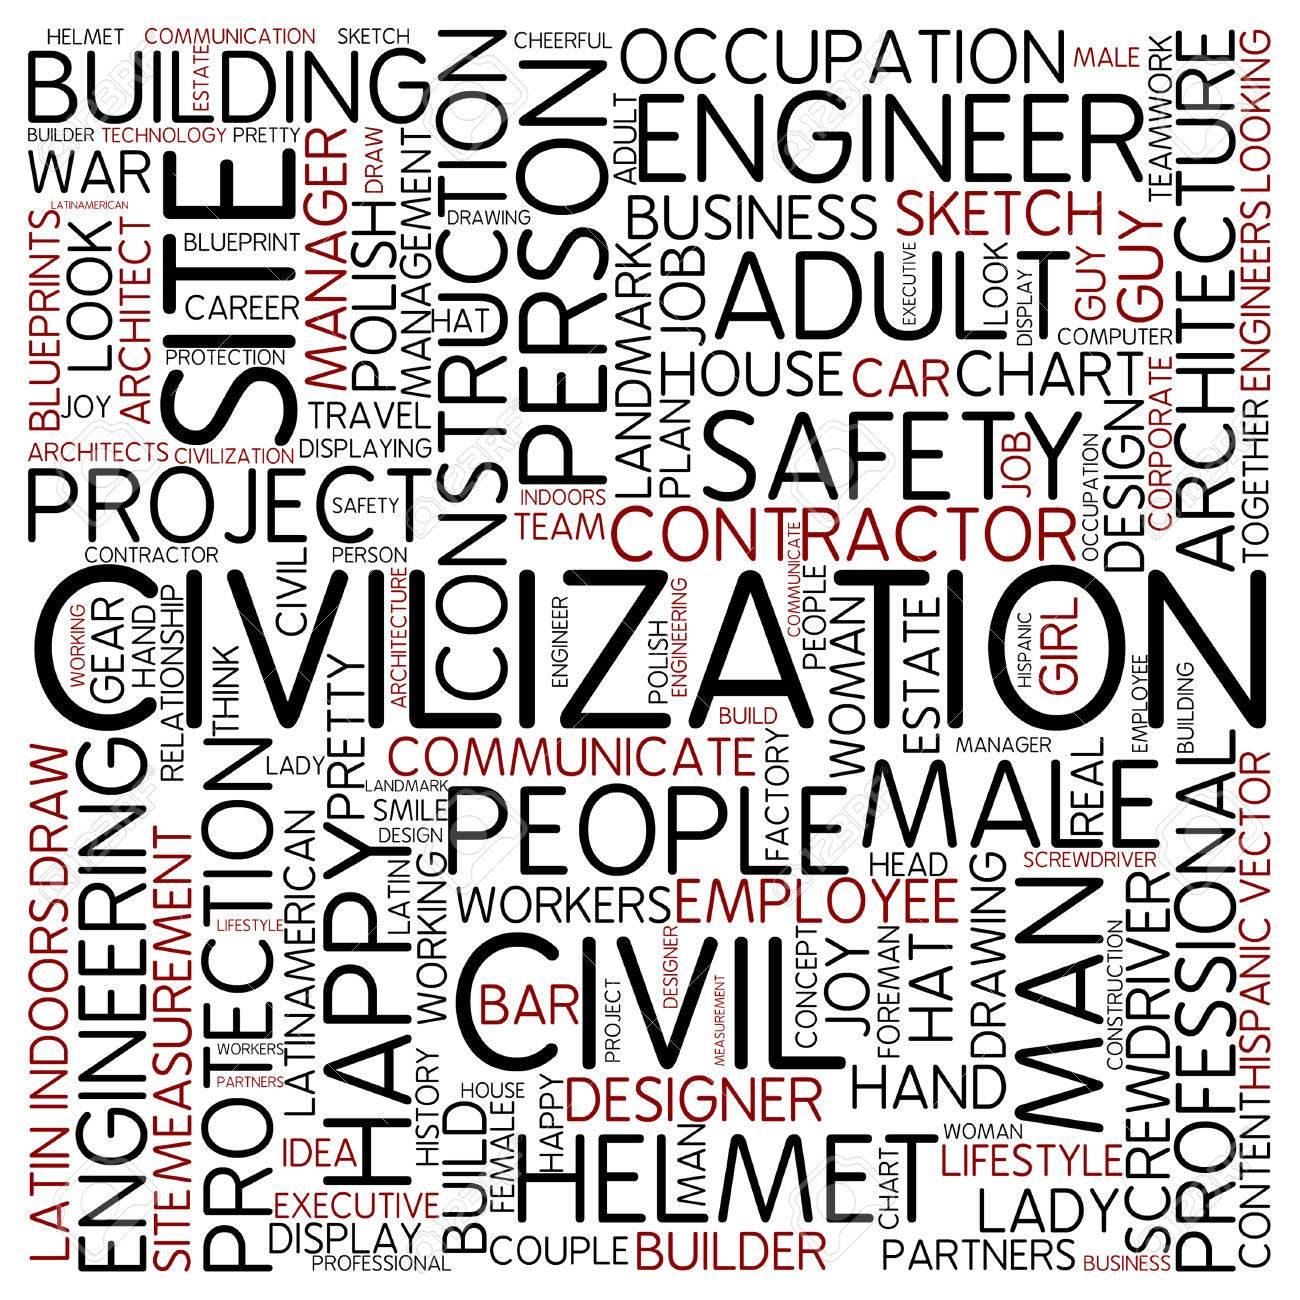 harappan tech in todays society essay